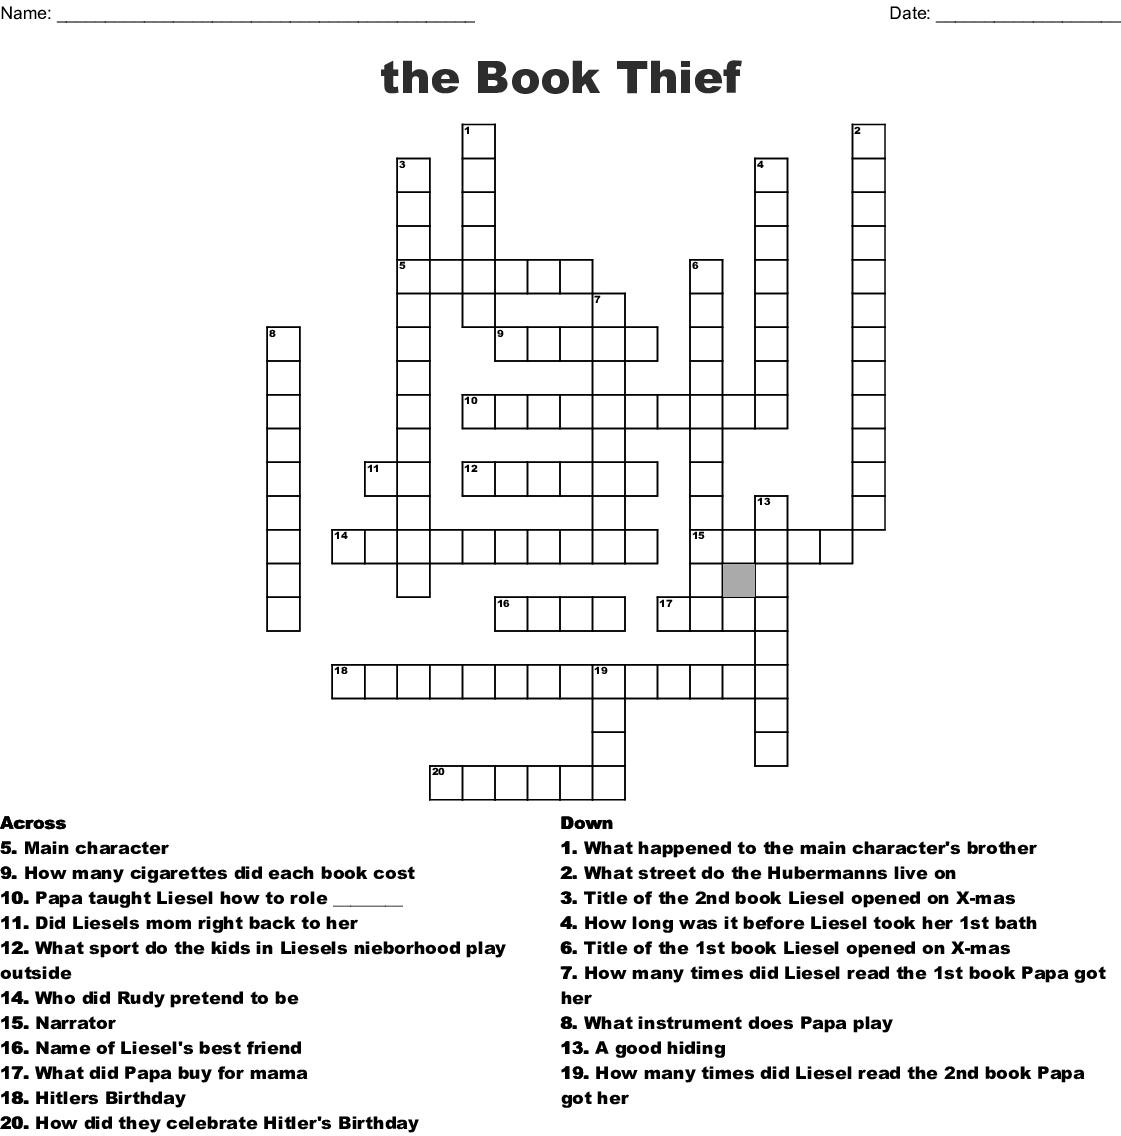 The Book Thief Crossword